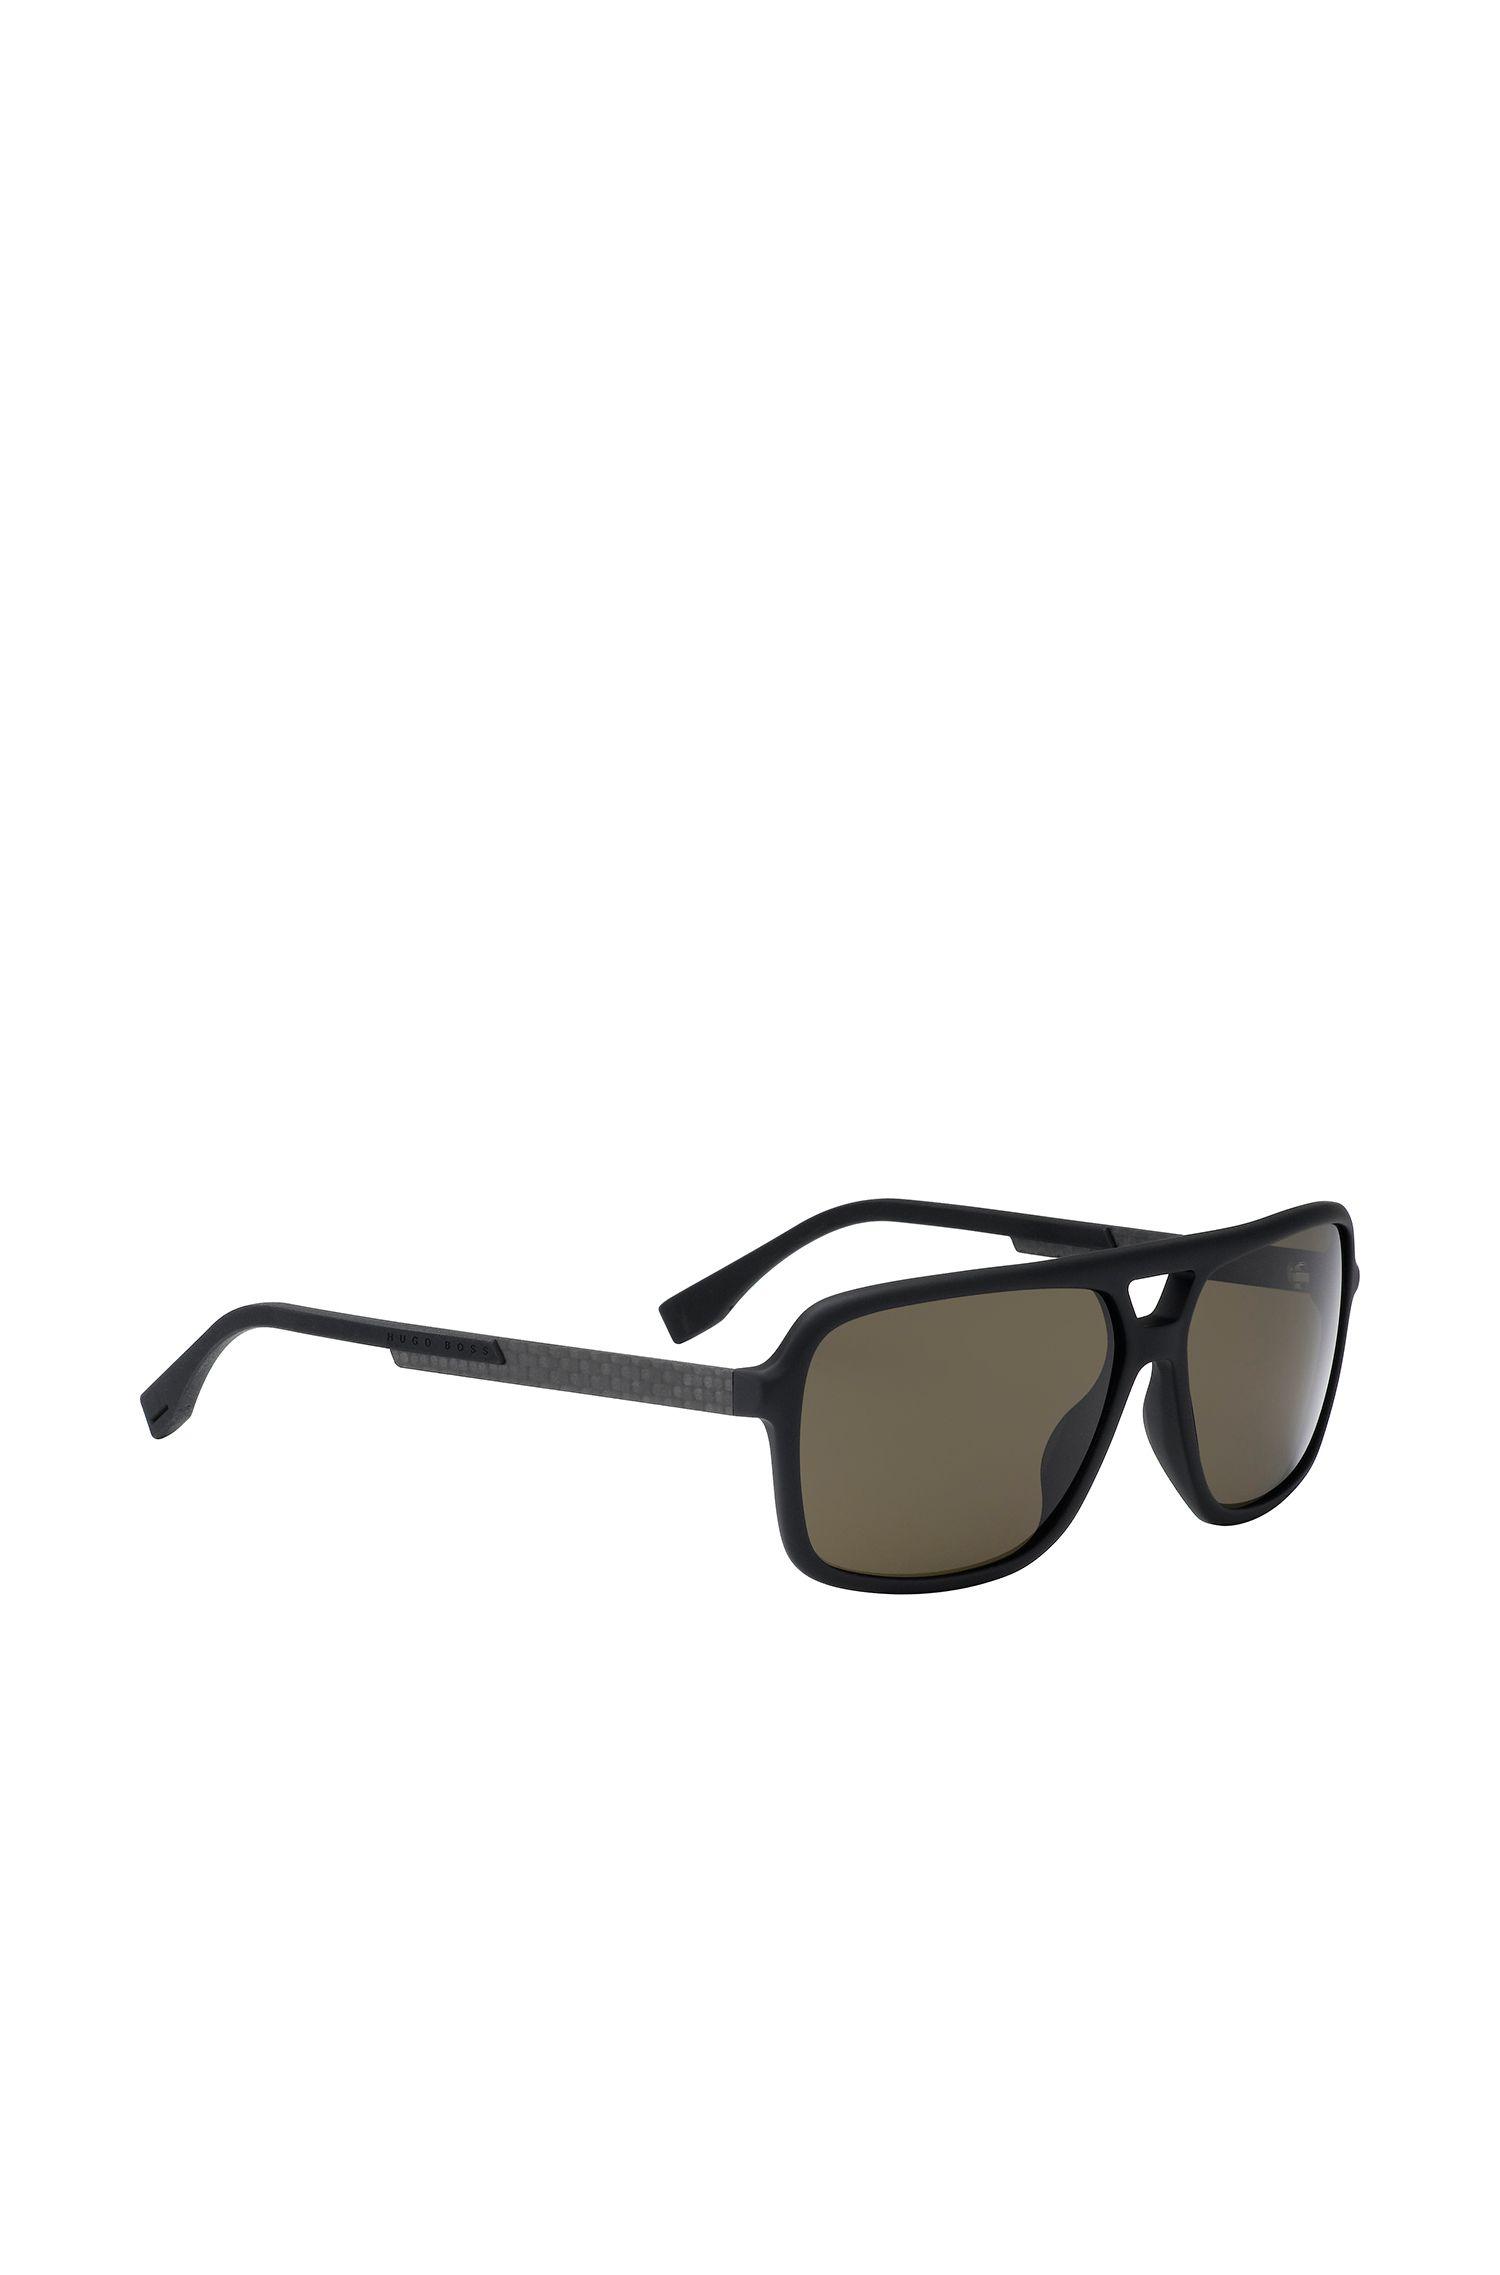 Brown Grey Lens Navigator Sunglasses | BOSS 0772S